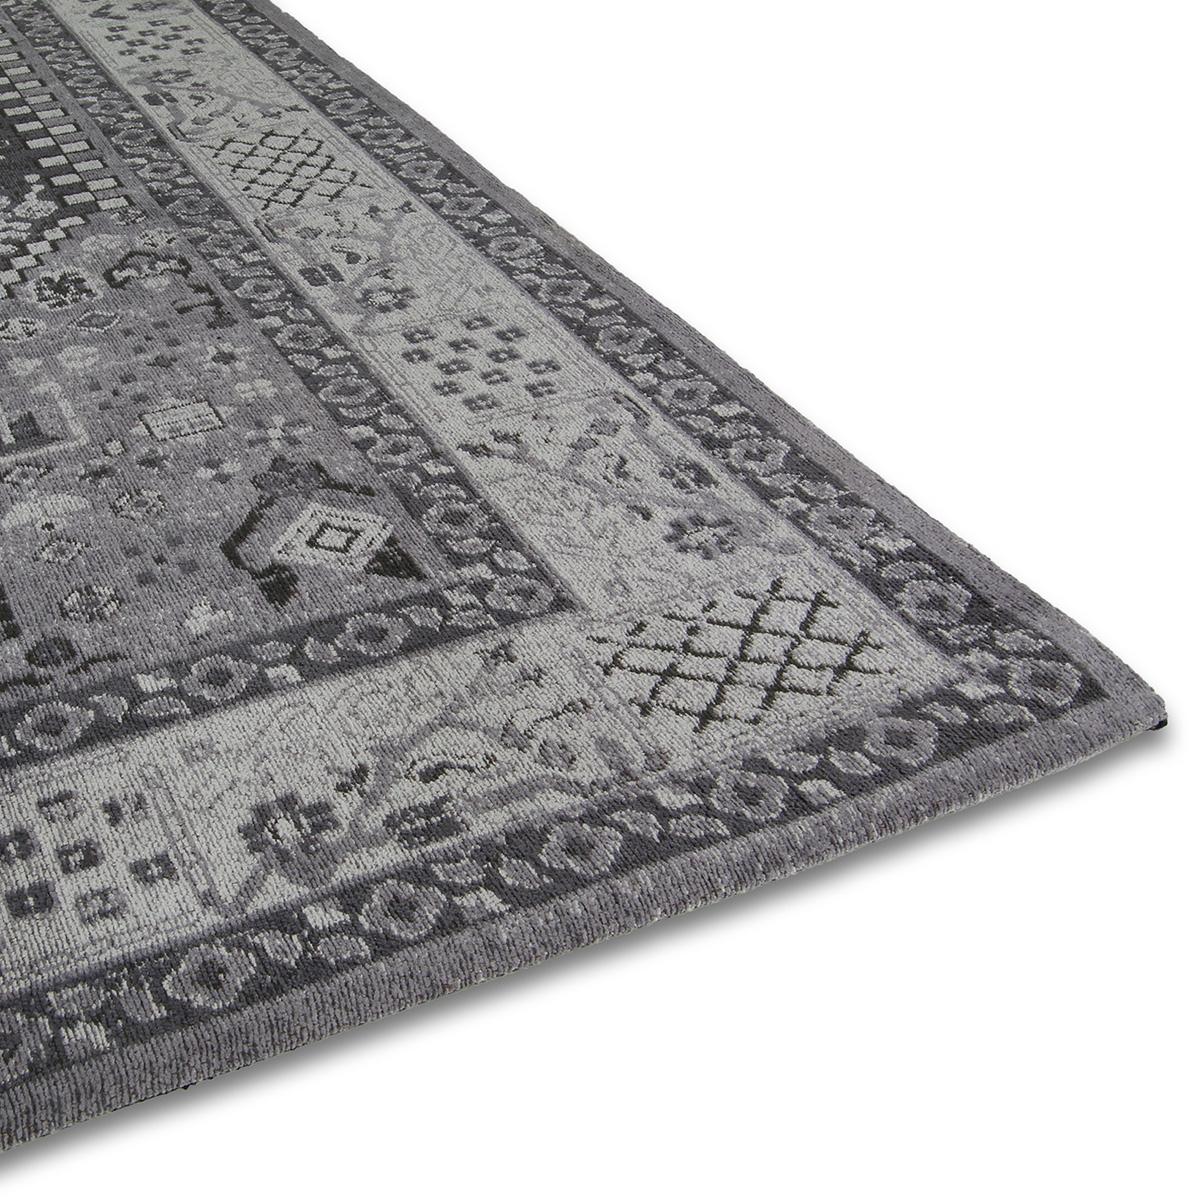 Vloerkleed Brinker Avanti Ash Grey | 200 x 290 cm